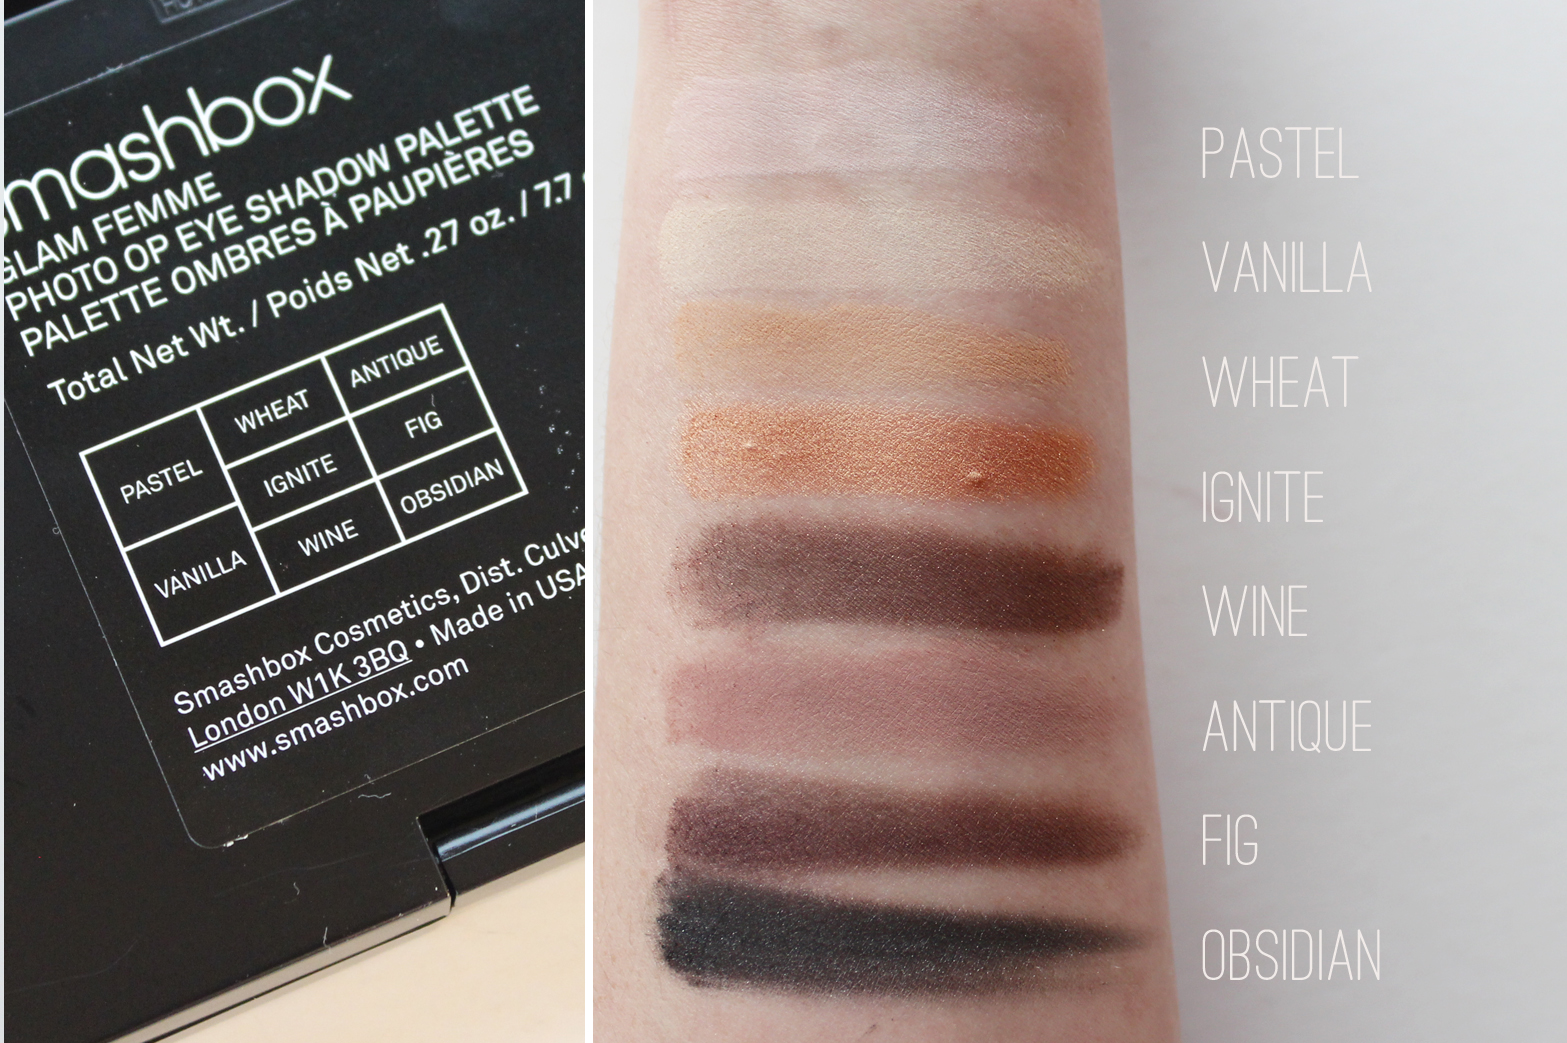 SMASHBOX | Glam Femme Makeup Set - Review + Swatches - CassandraMyee